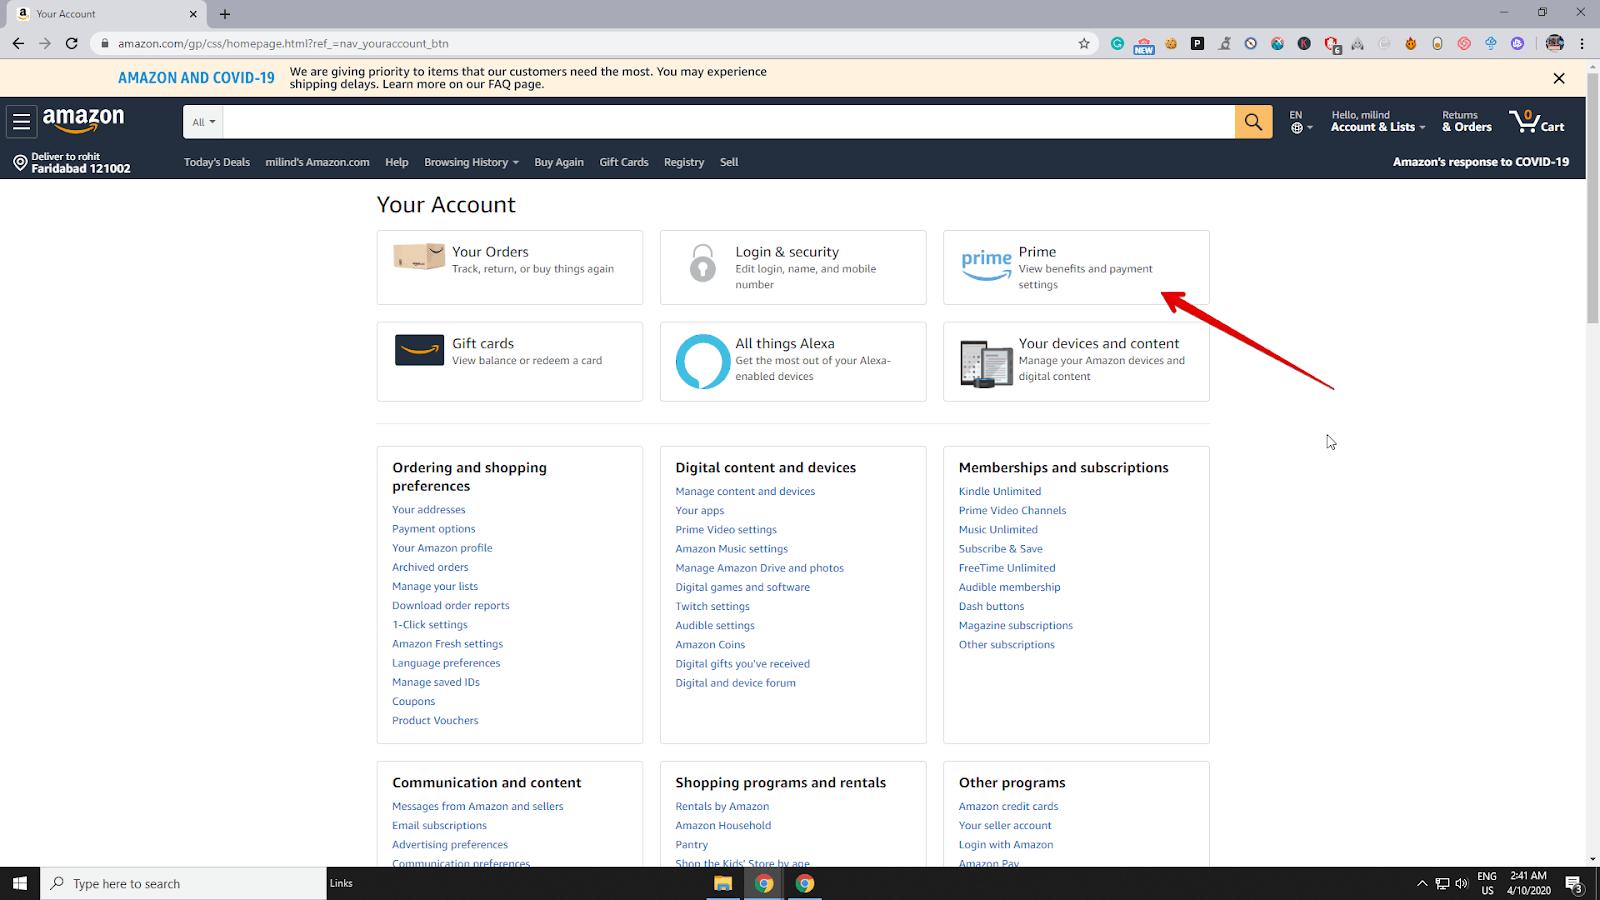 Amazon prime membership details